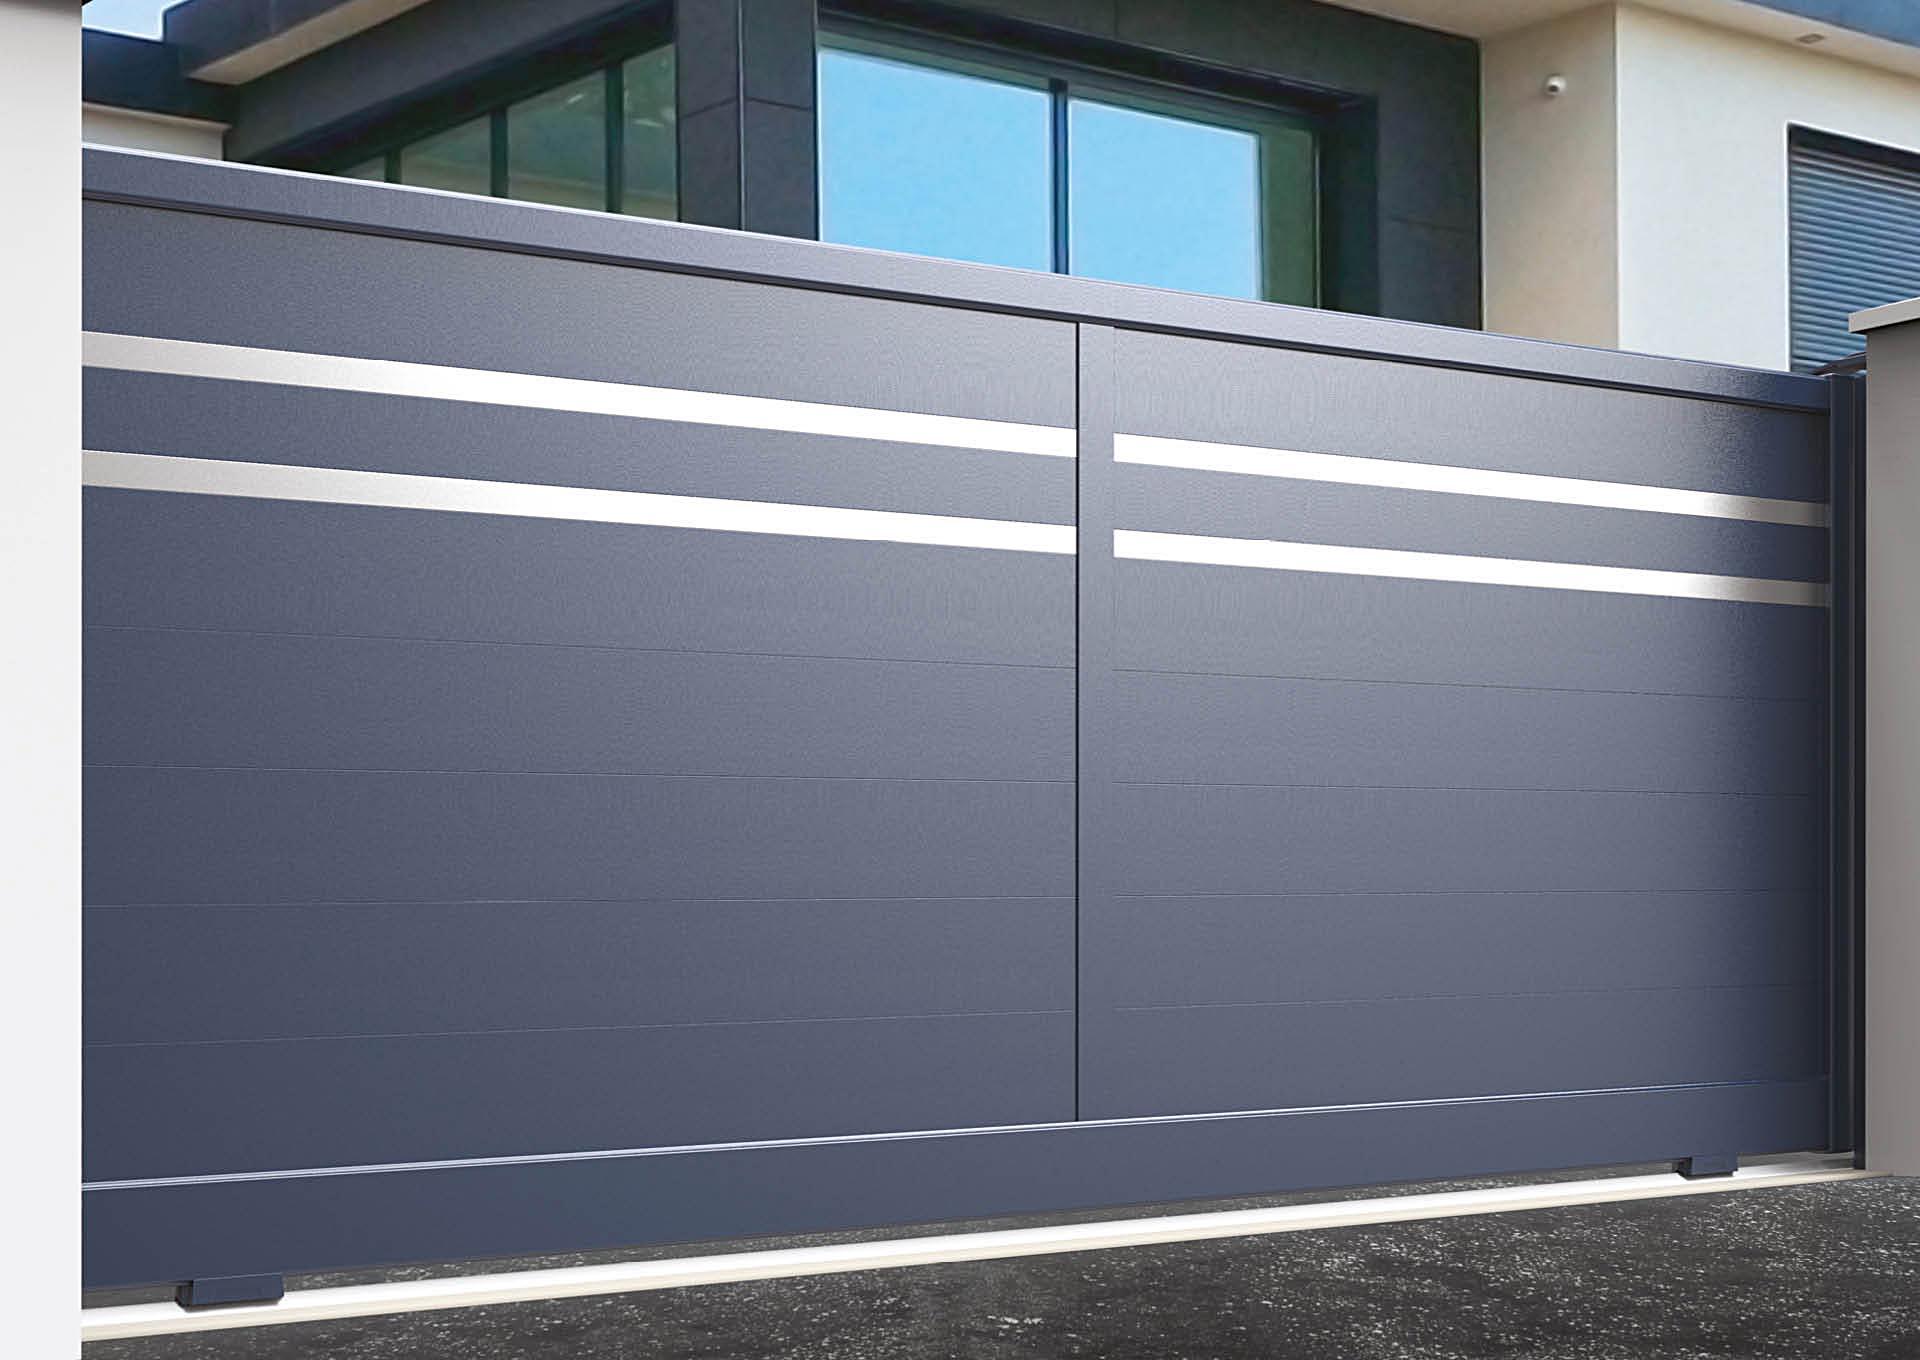 Portail coulissant aluminium Lames horizontales 200 mm + 2 liserés inox 50 mm